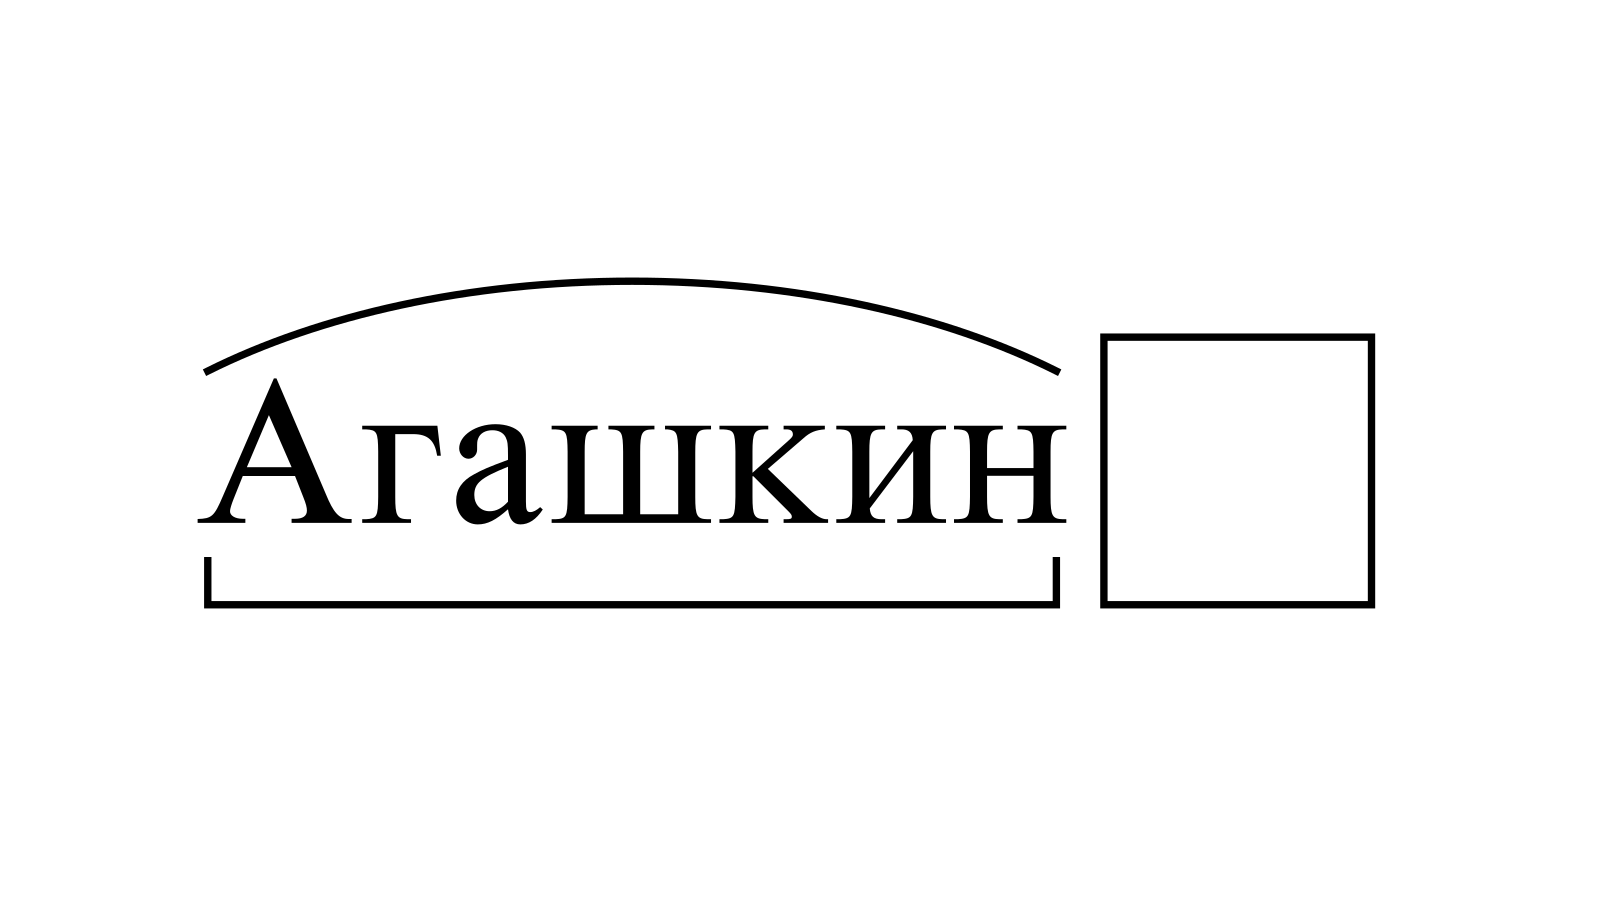 Разбор слова «Агашкин» по составу